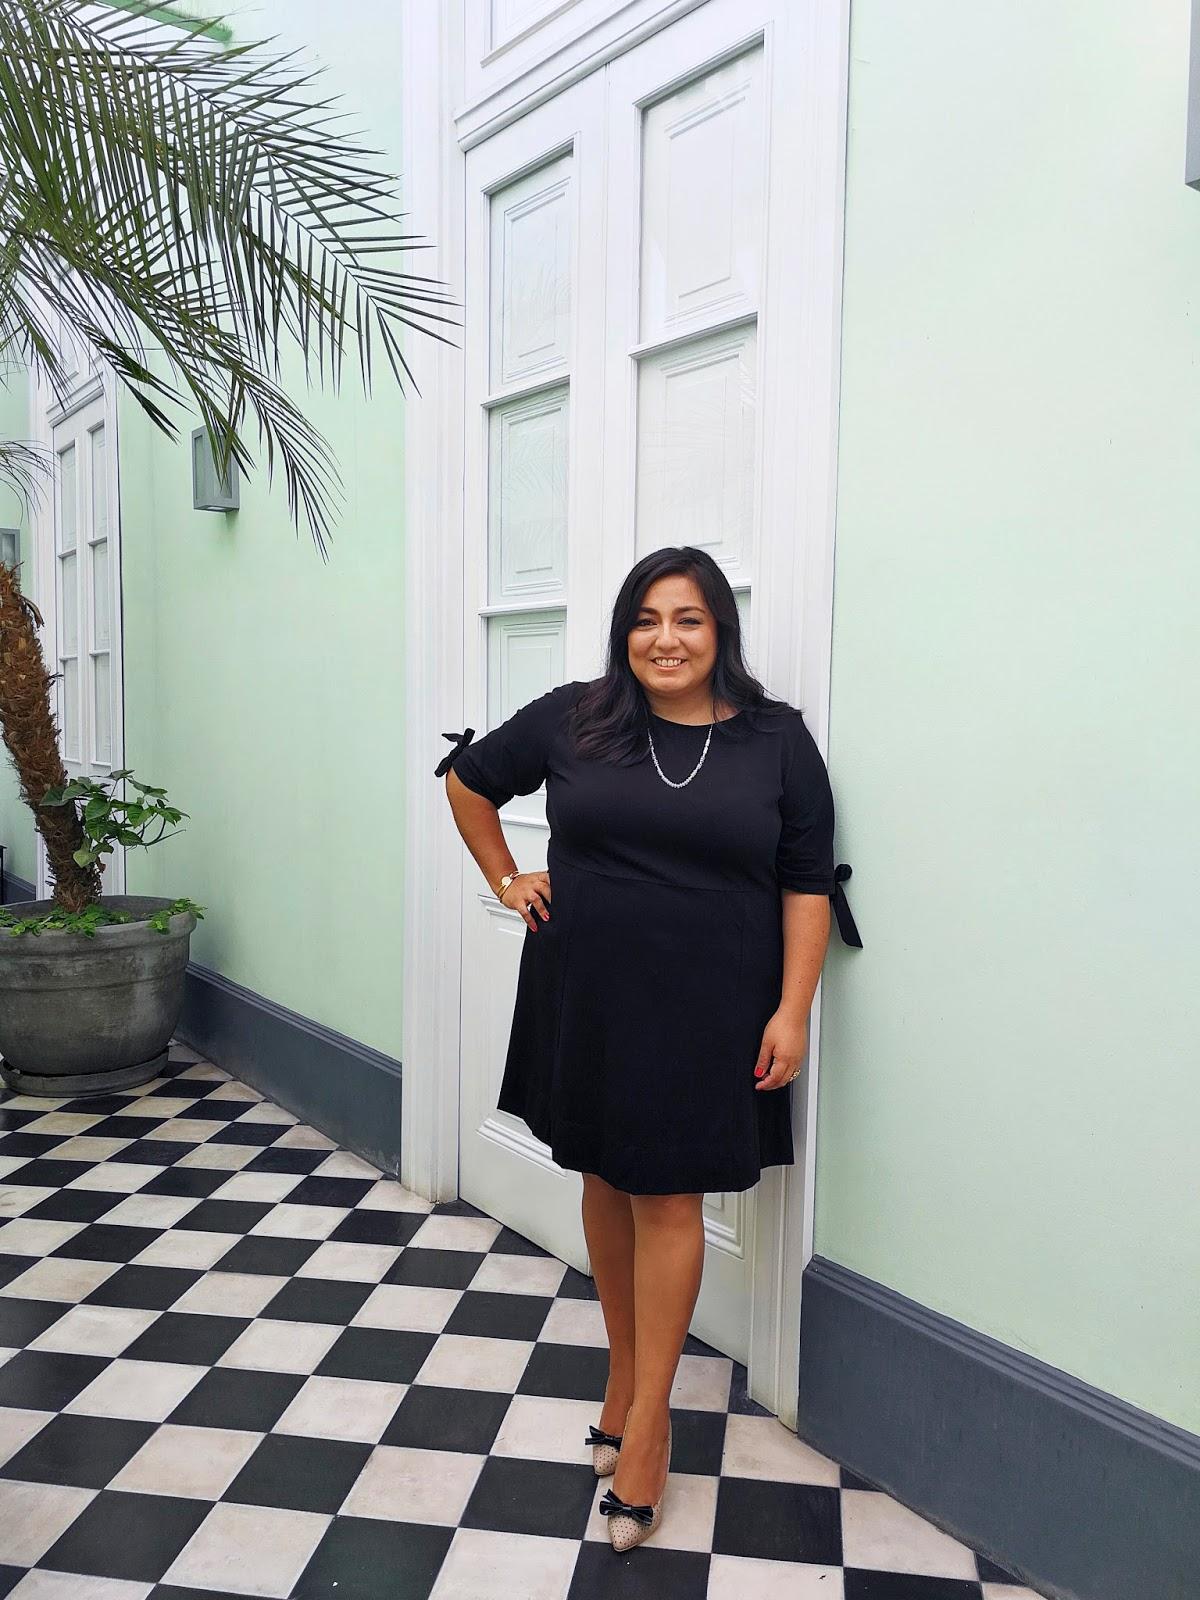 Black Dress - Look #HuaweiP10 #alexanderNeumann